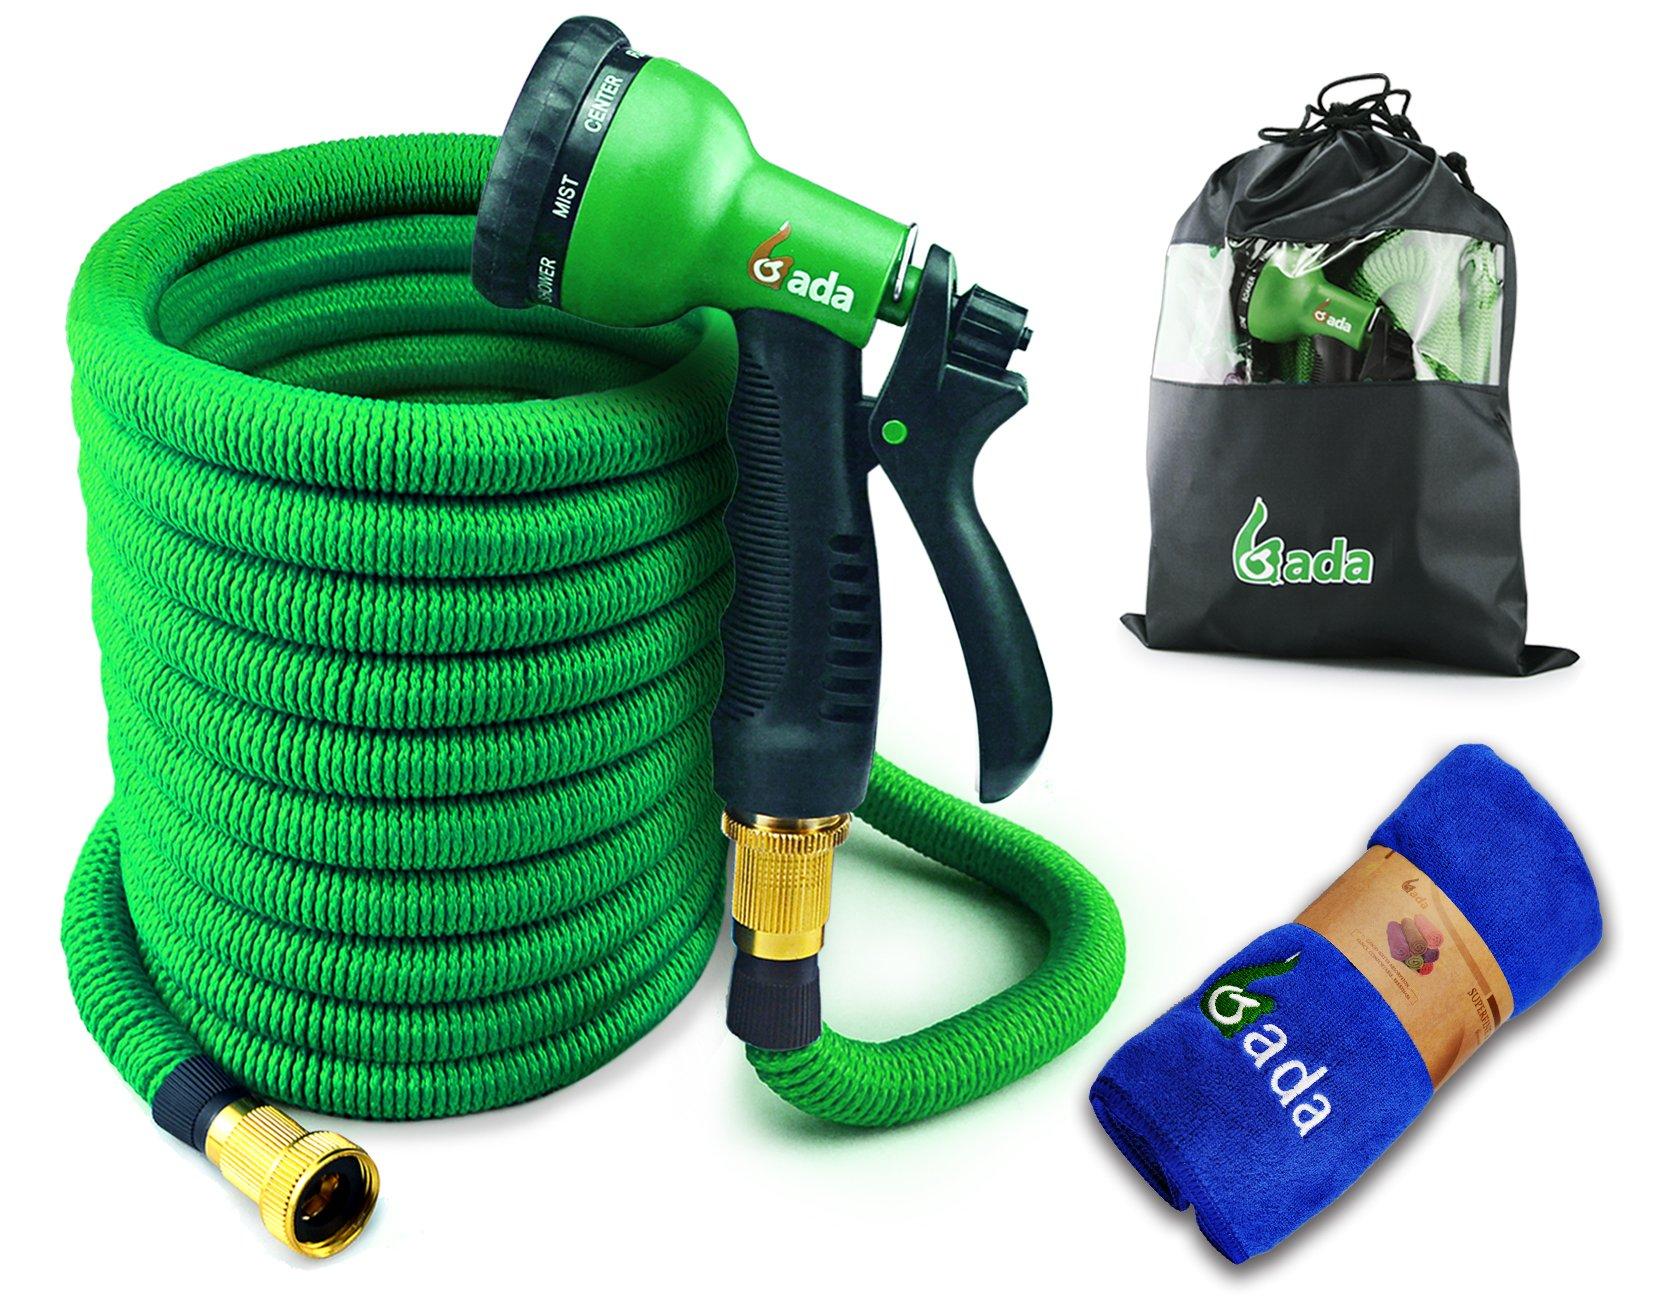 Gada Flexible Garden Hose Set 75 FT Heavy Duty Double Latex Core Expandable Water Hose-Including A 8 Function Sprayer Nozzle, 3/4 USA Standard Connector-1 Year Warranty (Green)